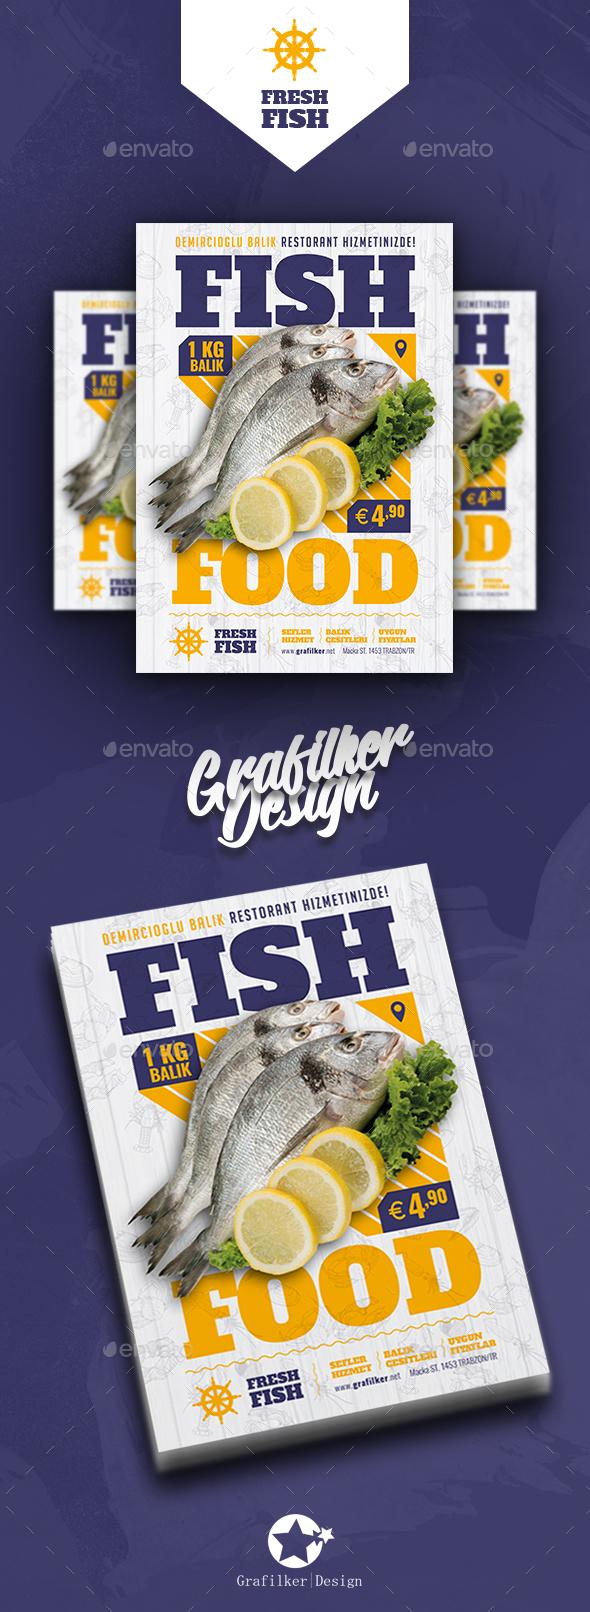 Sea Food Restaurant Flyer Templates - Restaurant Flyers